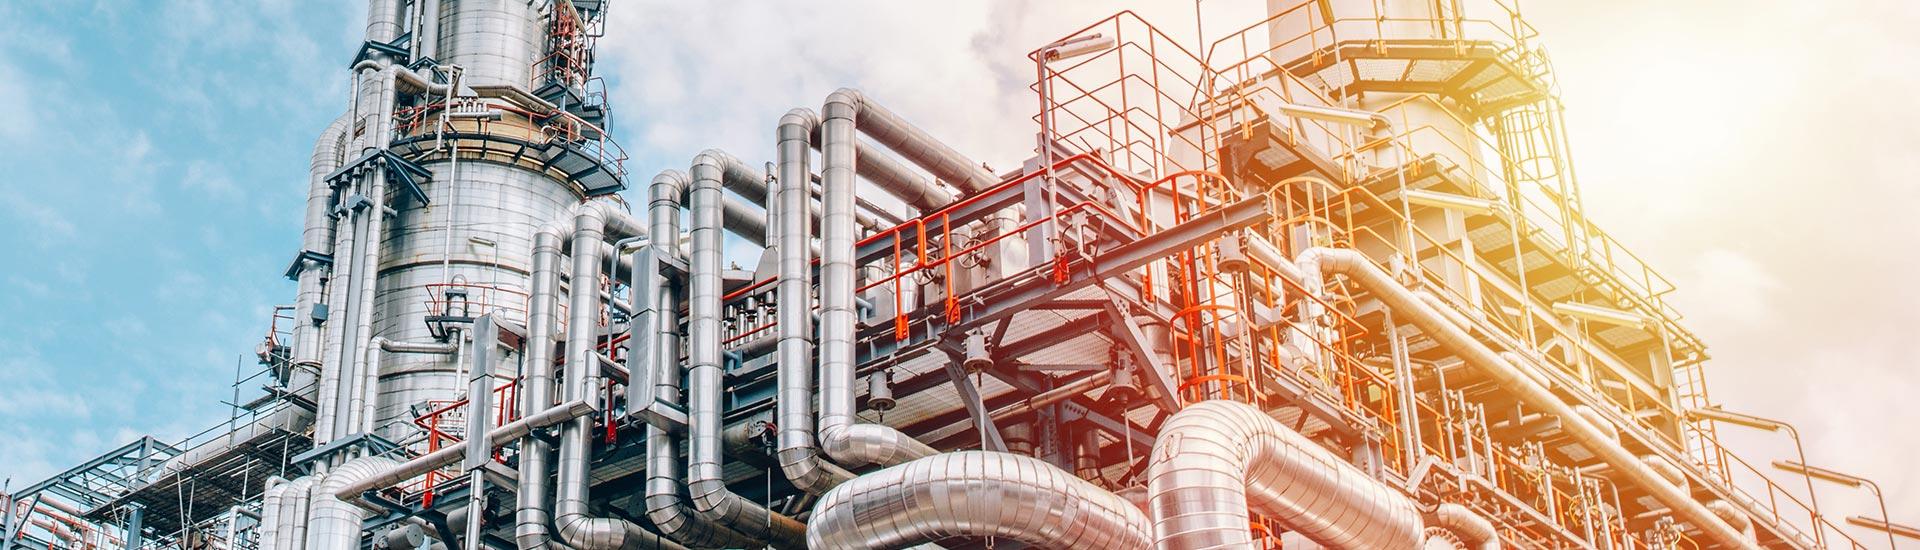 Rope access specialist proces en petrochemie header